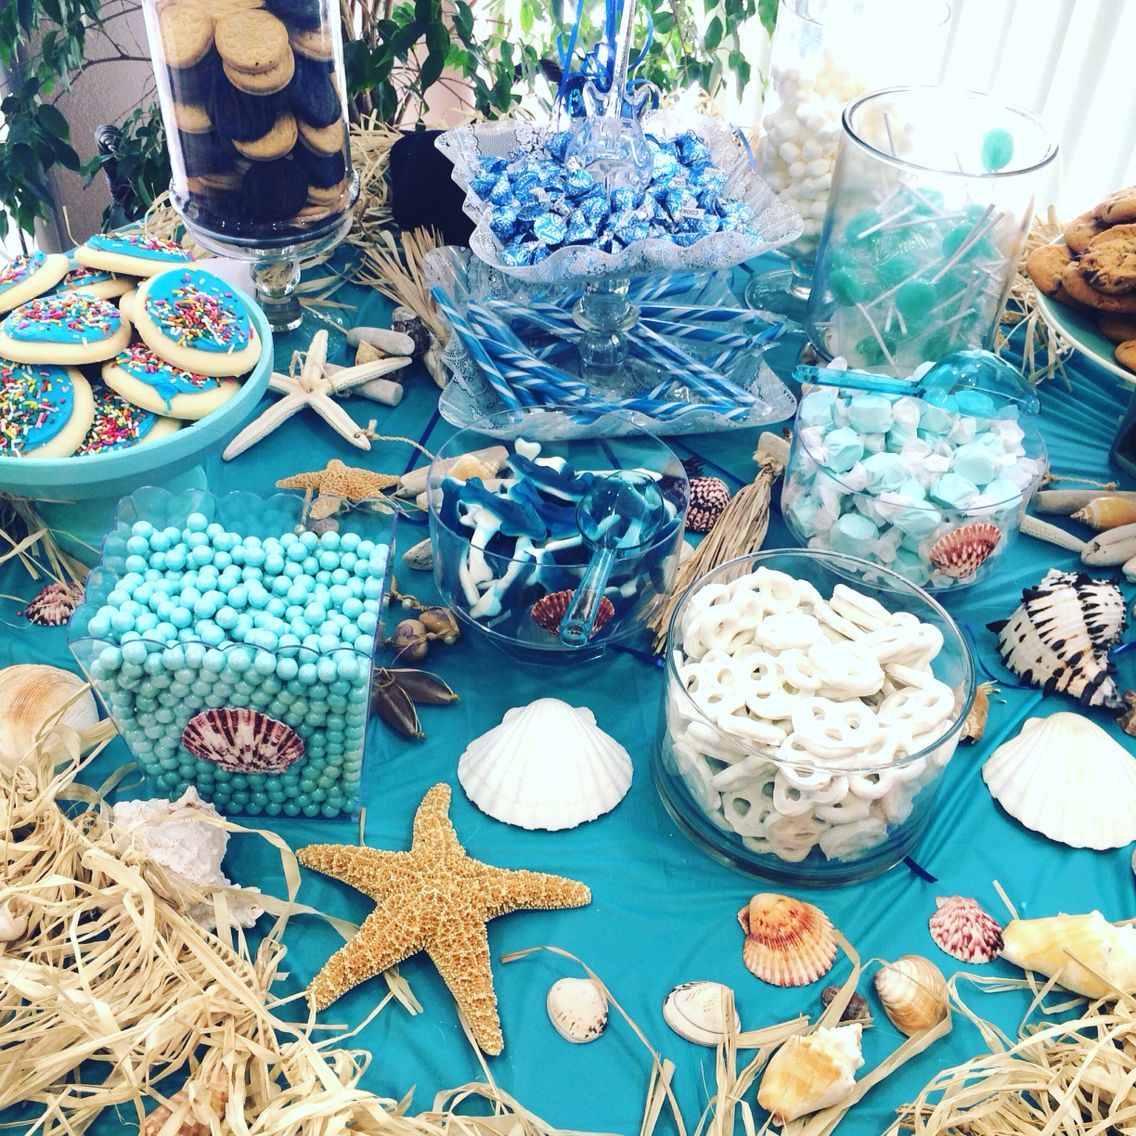 Under The Sea Dessert Table #bluecandy #mermaids